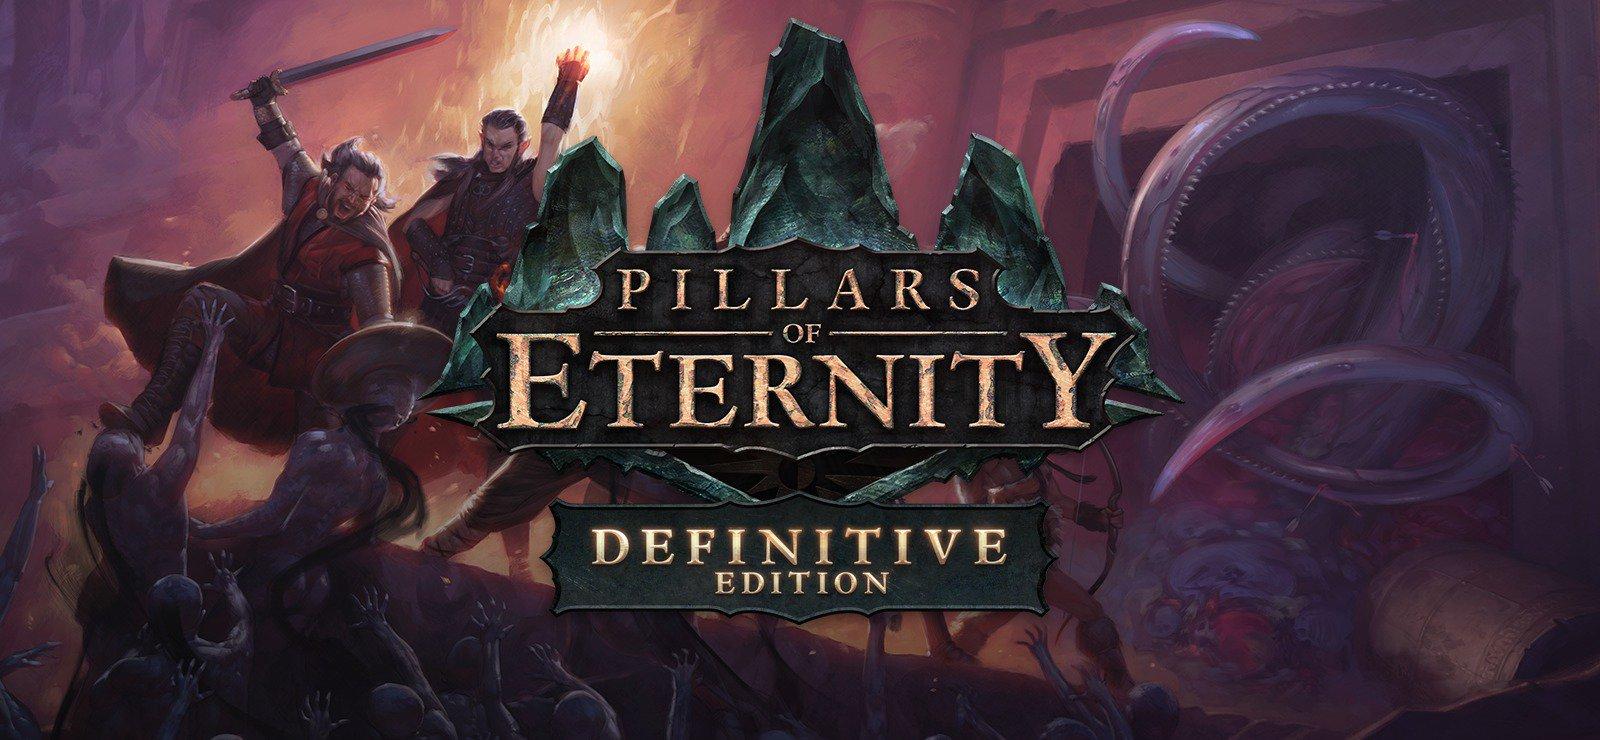 Pillars of Eternity Definitive Edition #GryNaWakacje